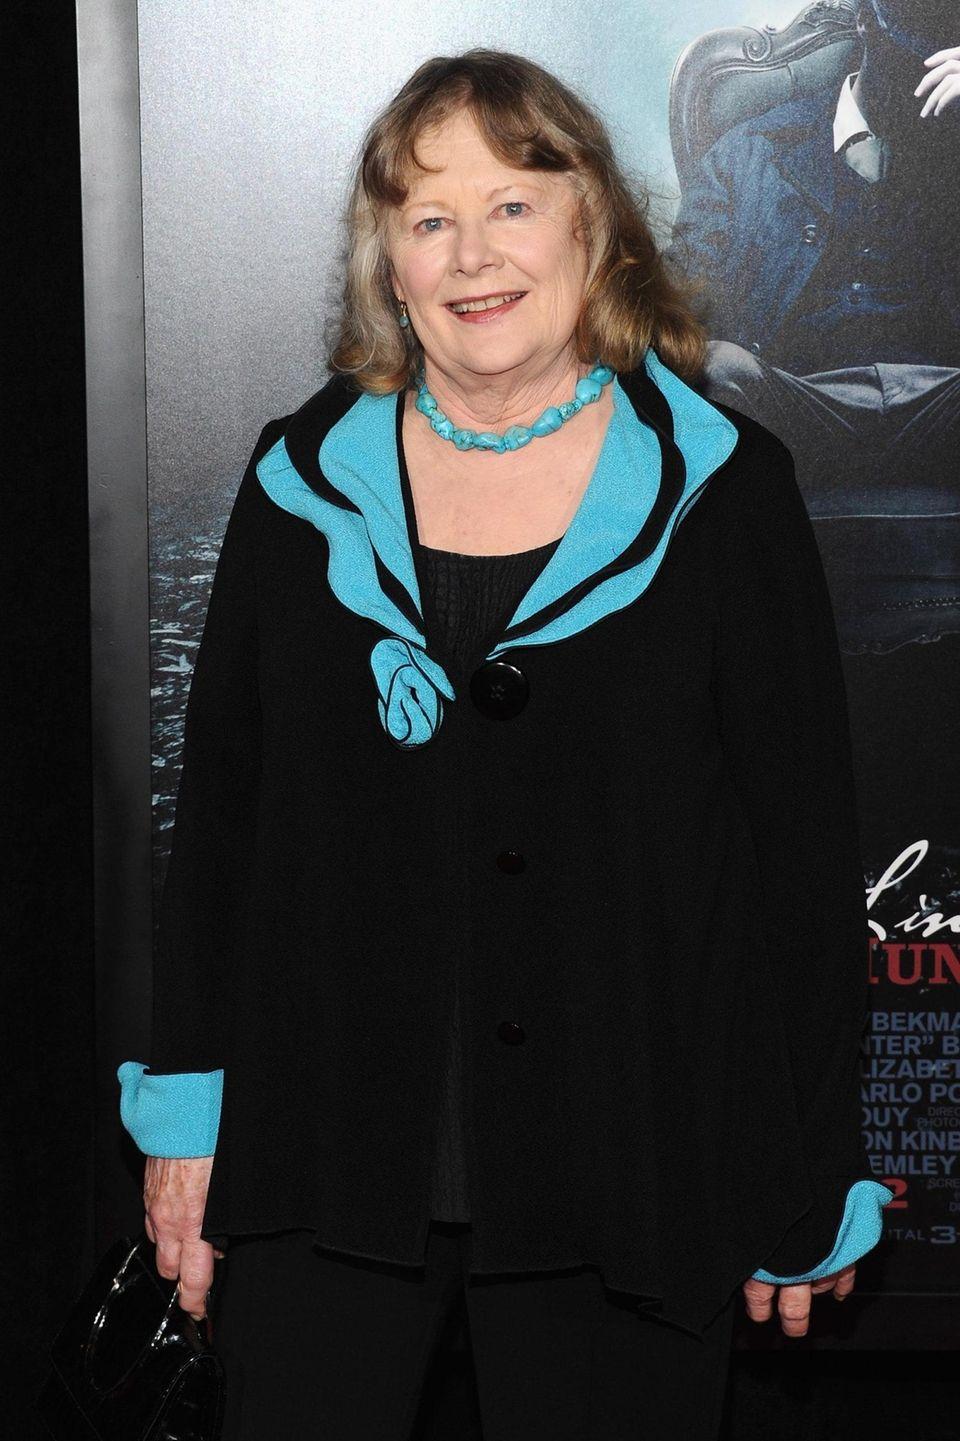 NEW YORK, NY - JUNE 18: Actress Shirley